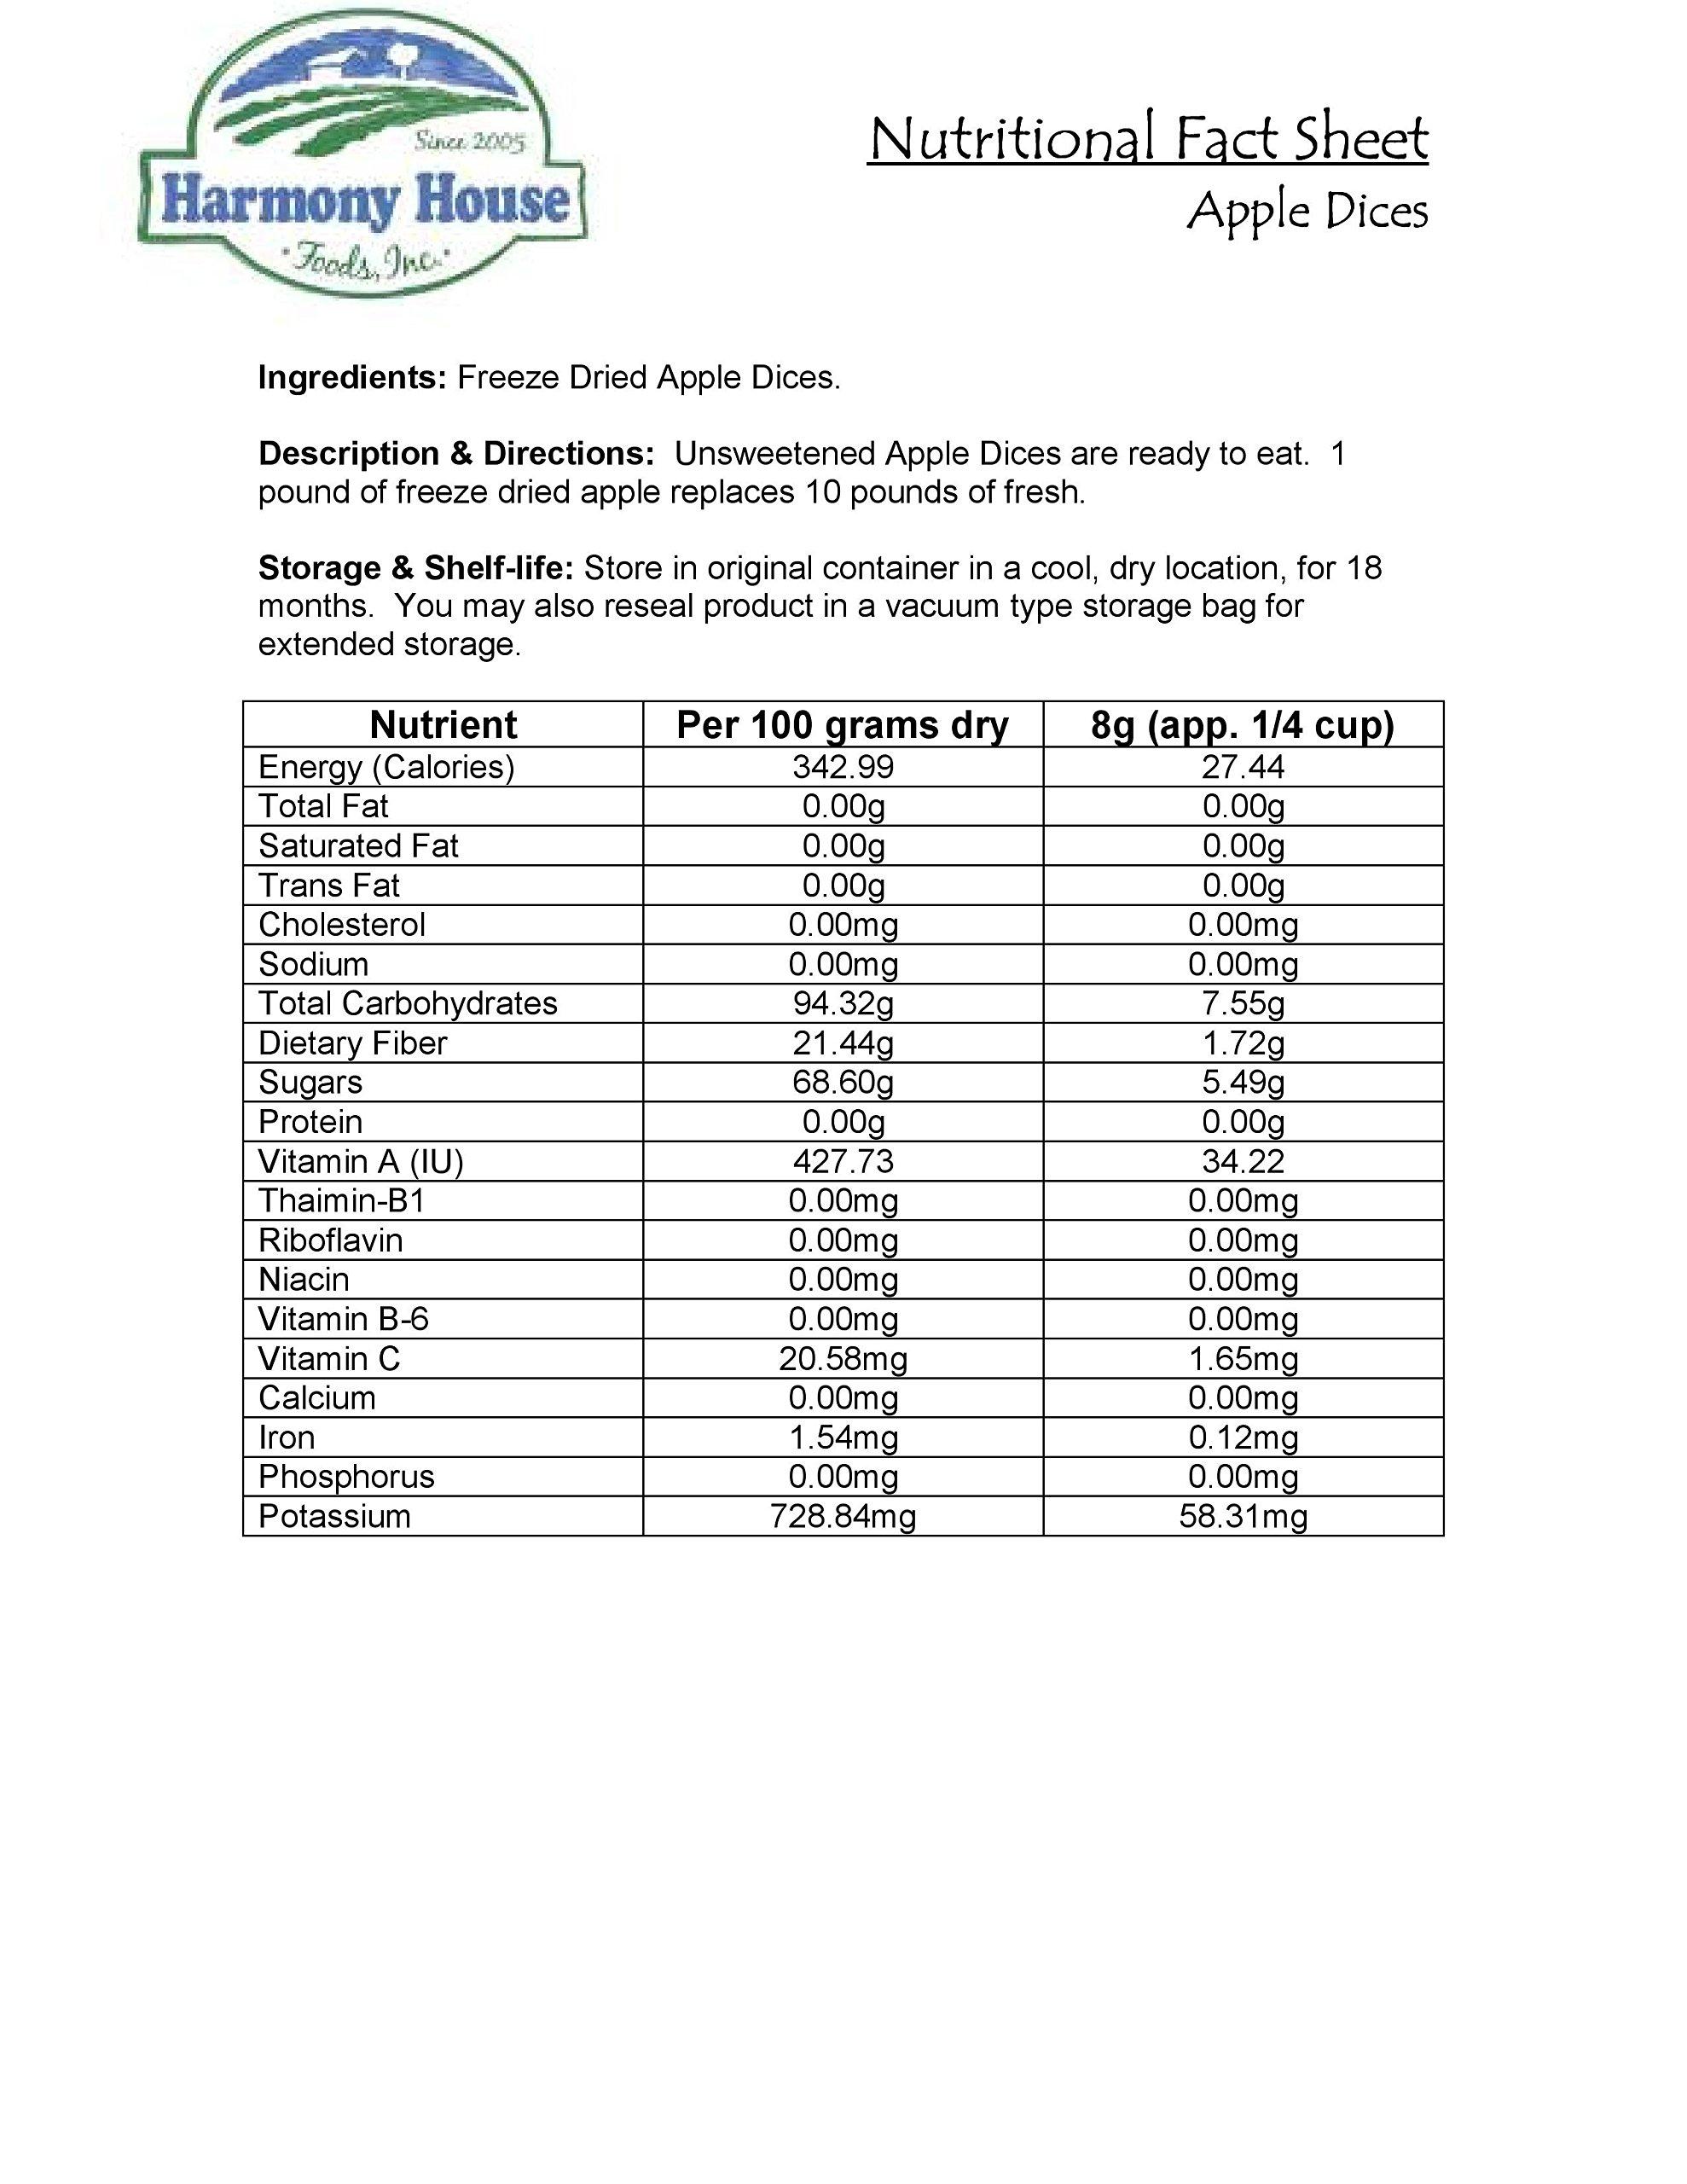 Harmony House Foods Freeze Dried Apples, Diced (20 lb Bulk Box)